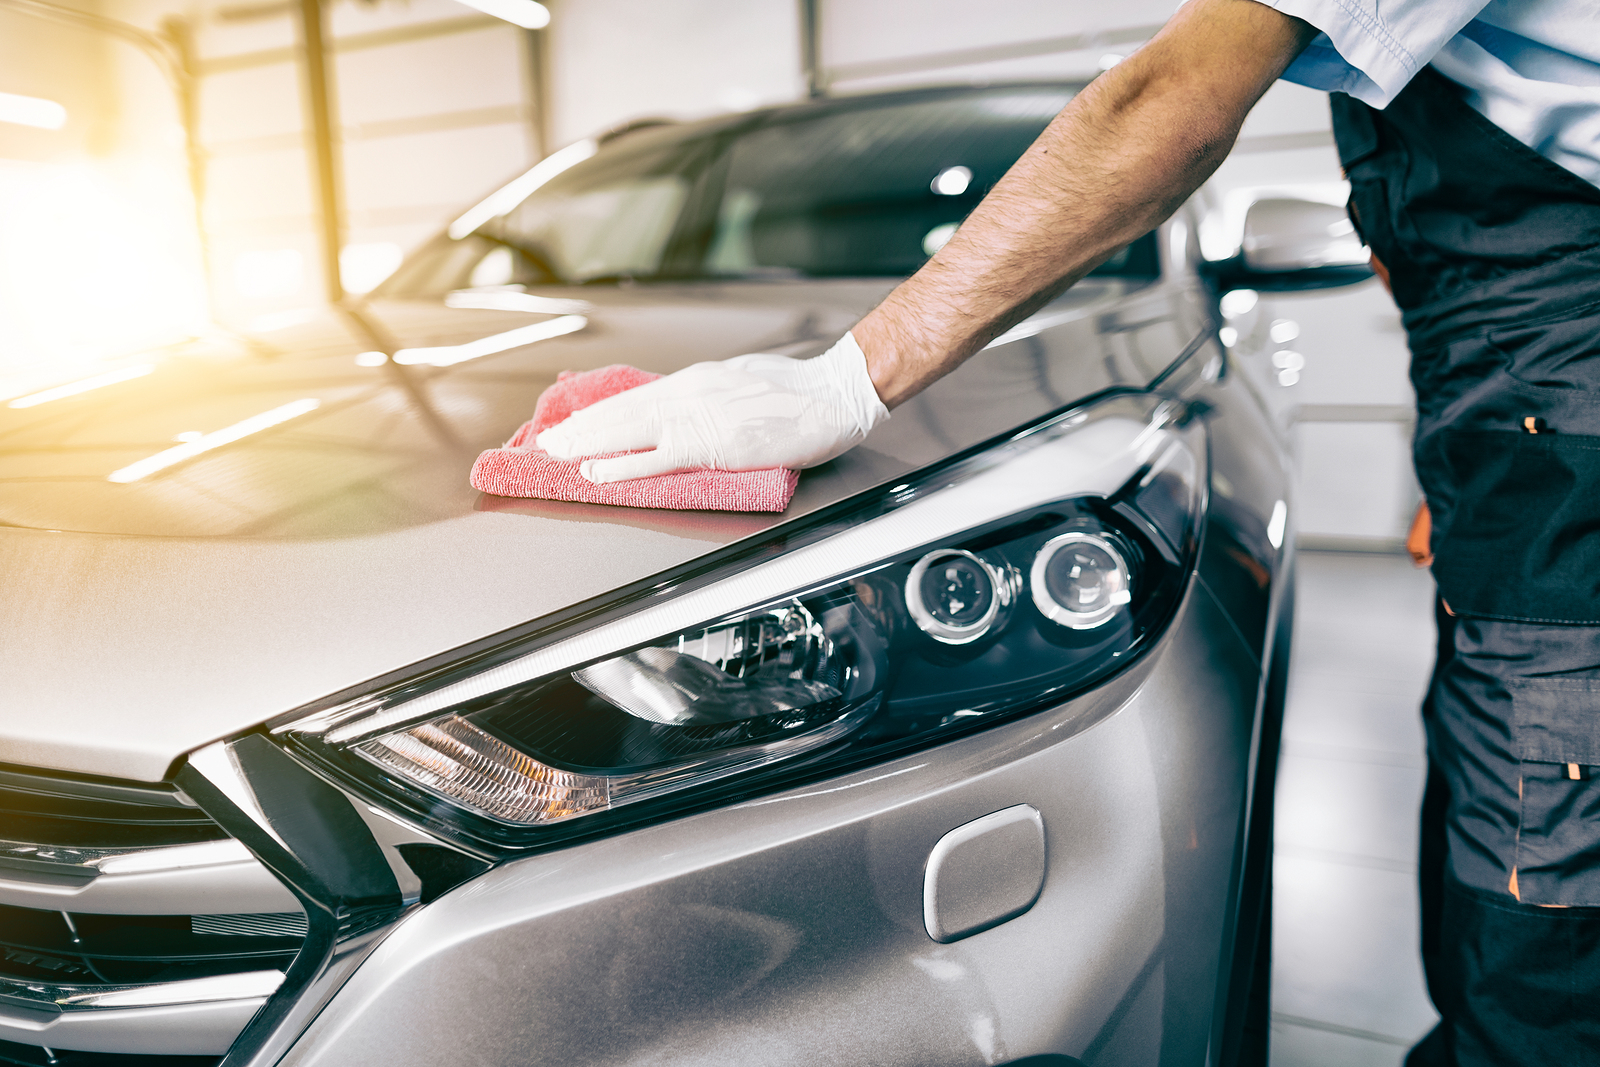 Oem Nano Harde Auto Care Magic Crystal Shine Wax, Auto Wassen Coating Carnaubawas